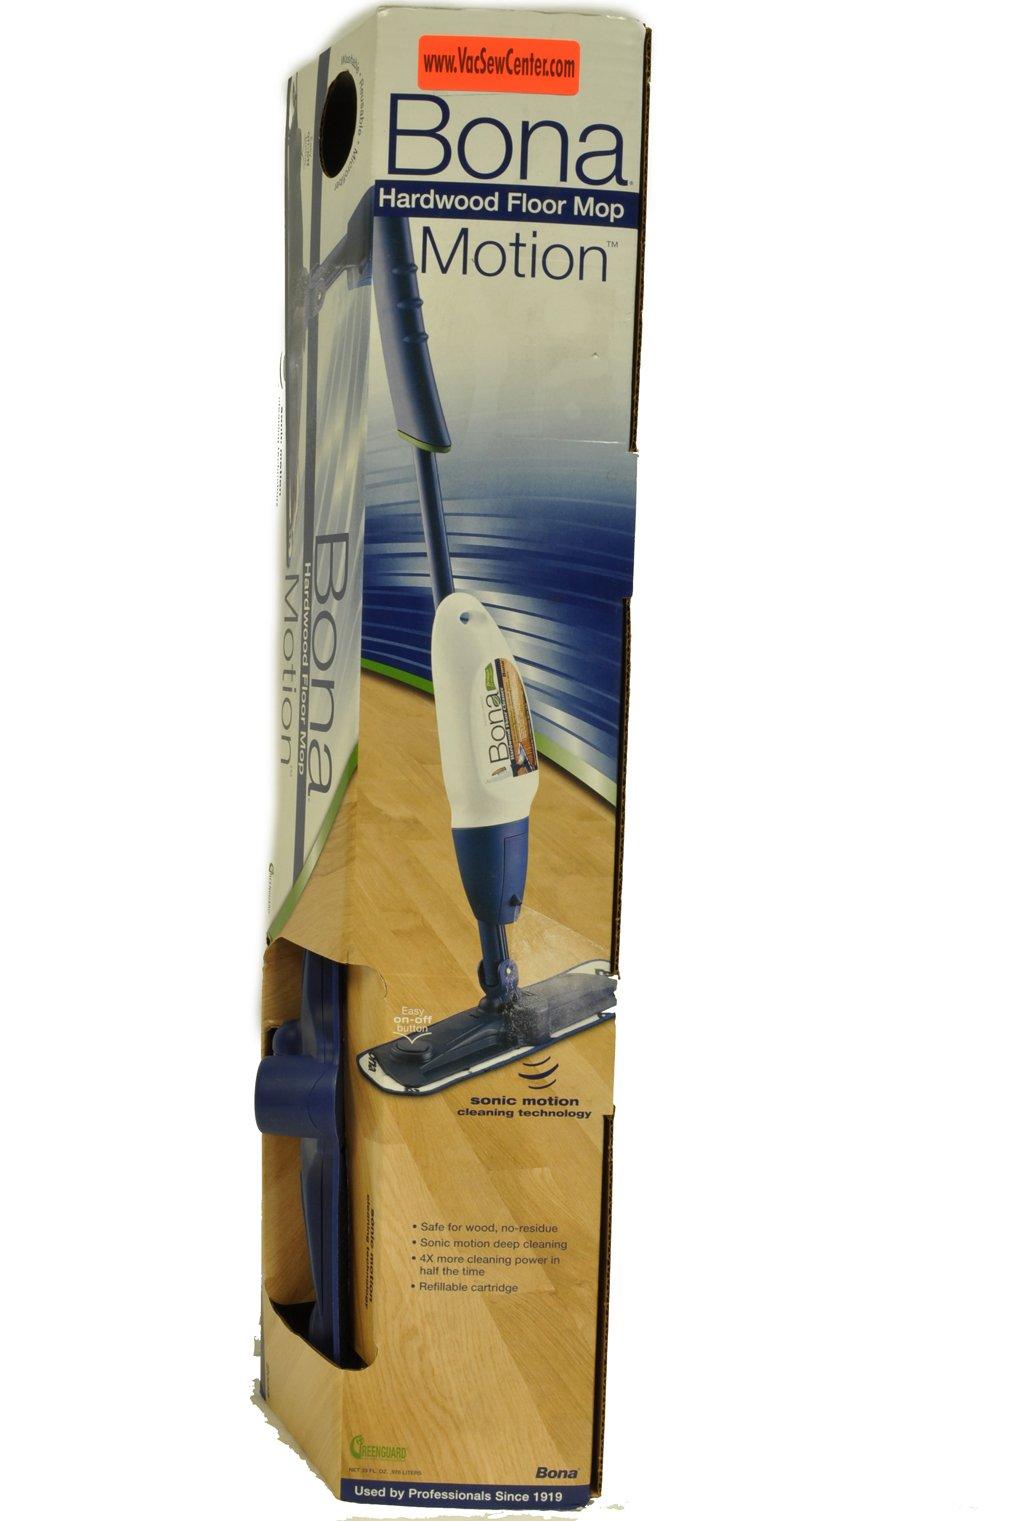 Bona Hardwood Floor Vibrating Mop BK-710013405